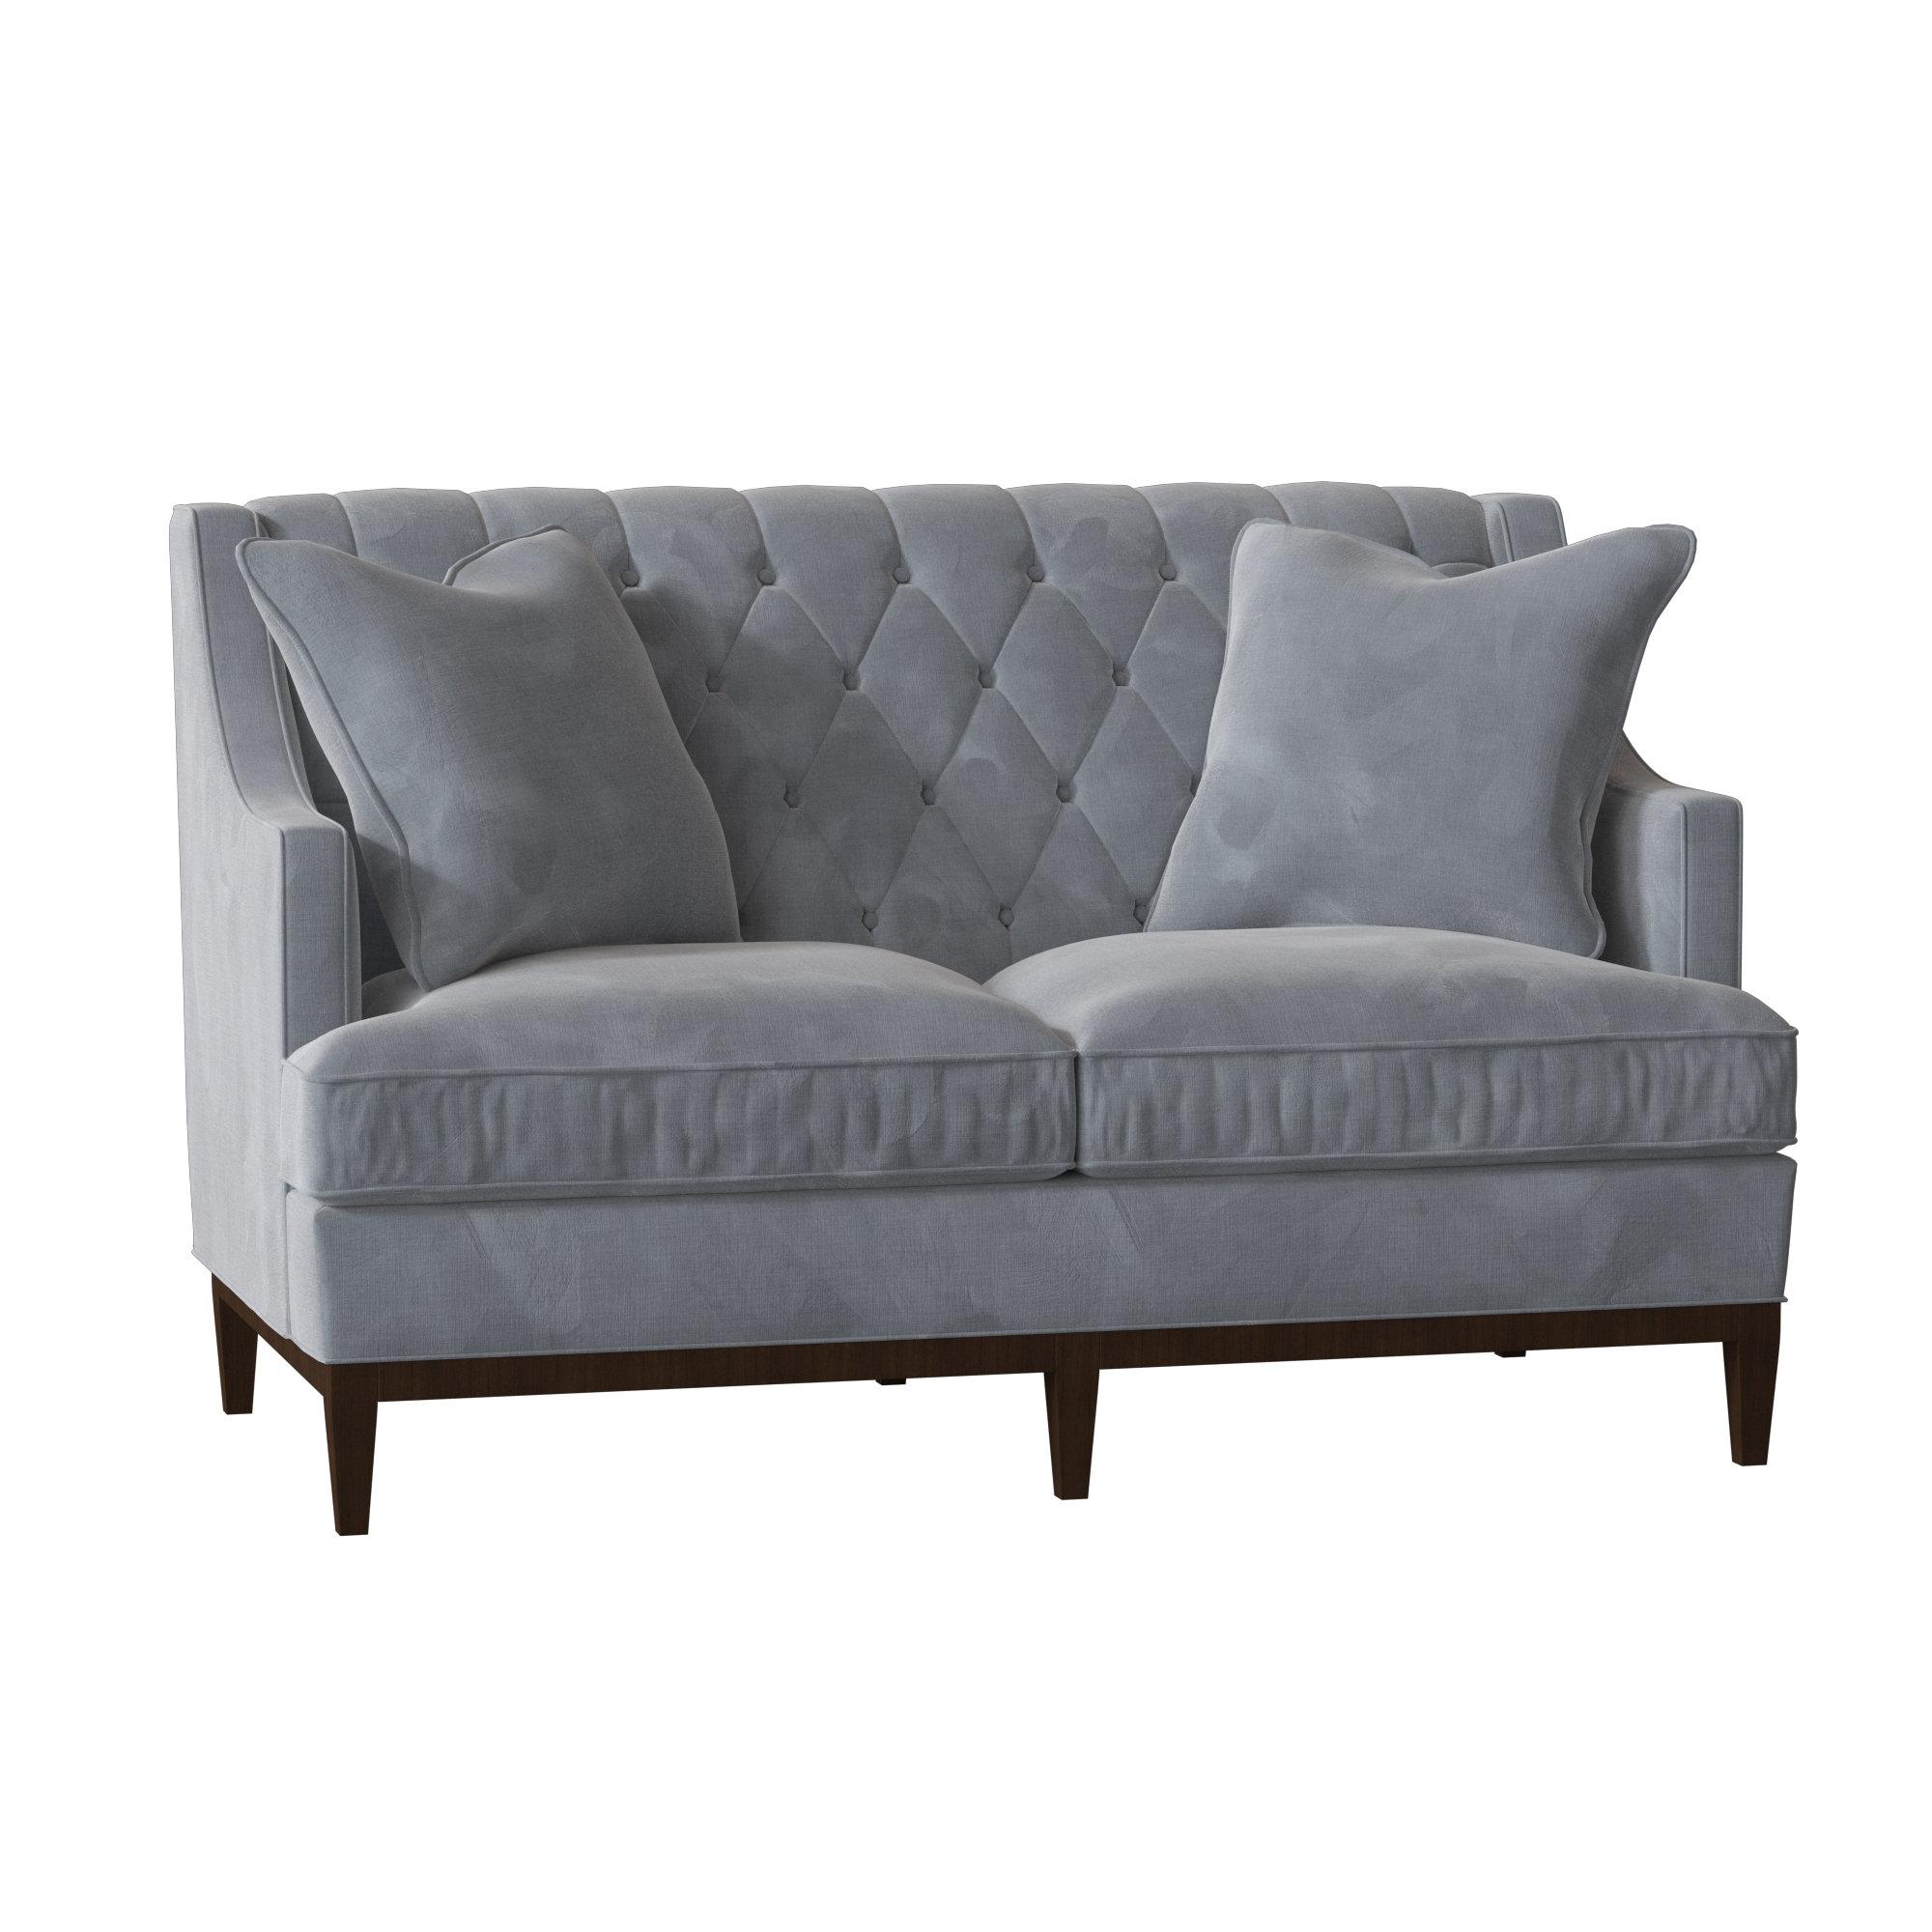 Duralee Furniture Carmel 60 Recessed Arm Loveseat